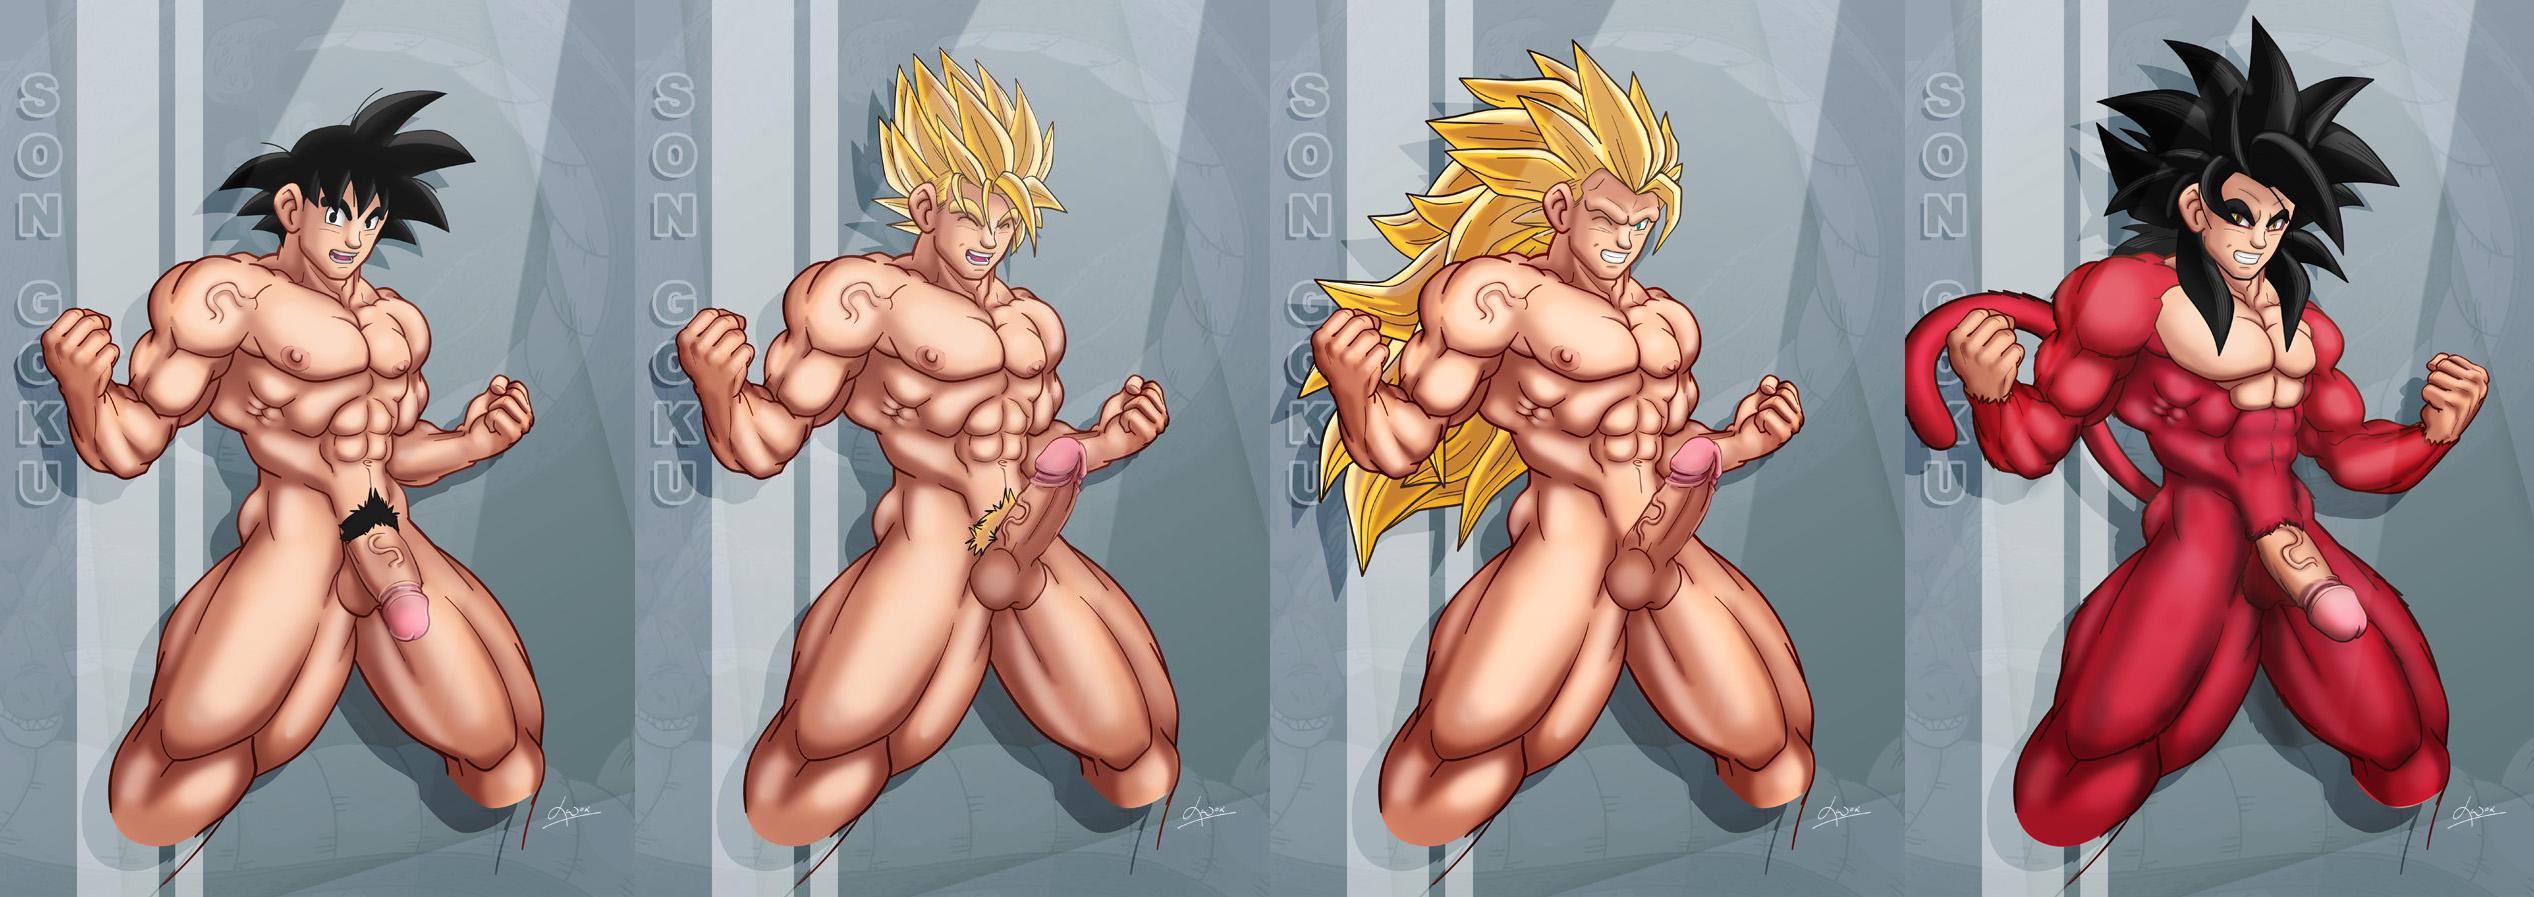 Naked athletic men